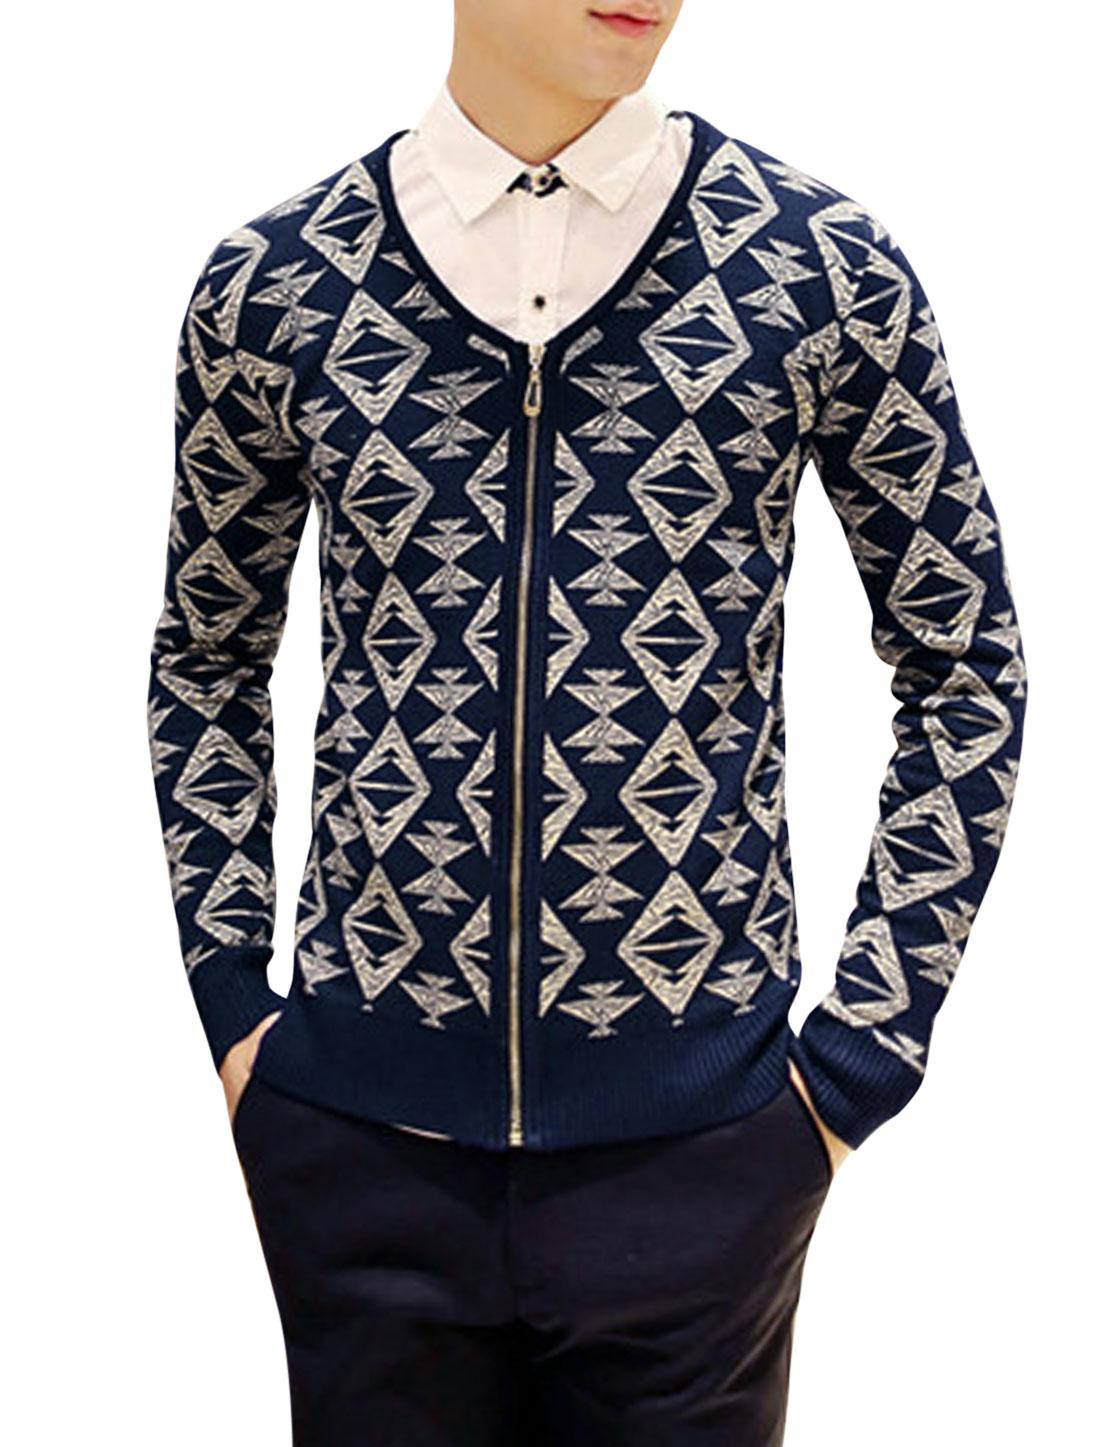 Man Navy Blue Long Sleeves V Neck Zippered Front Cardigan S